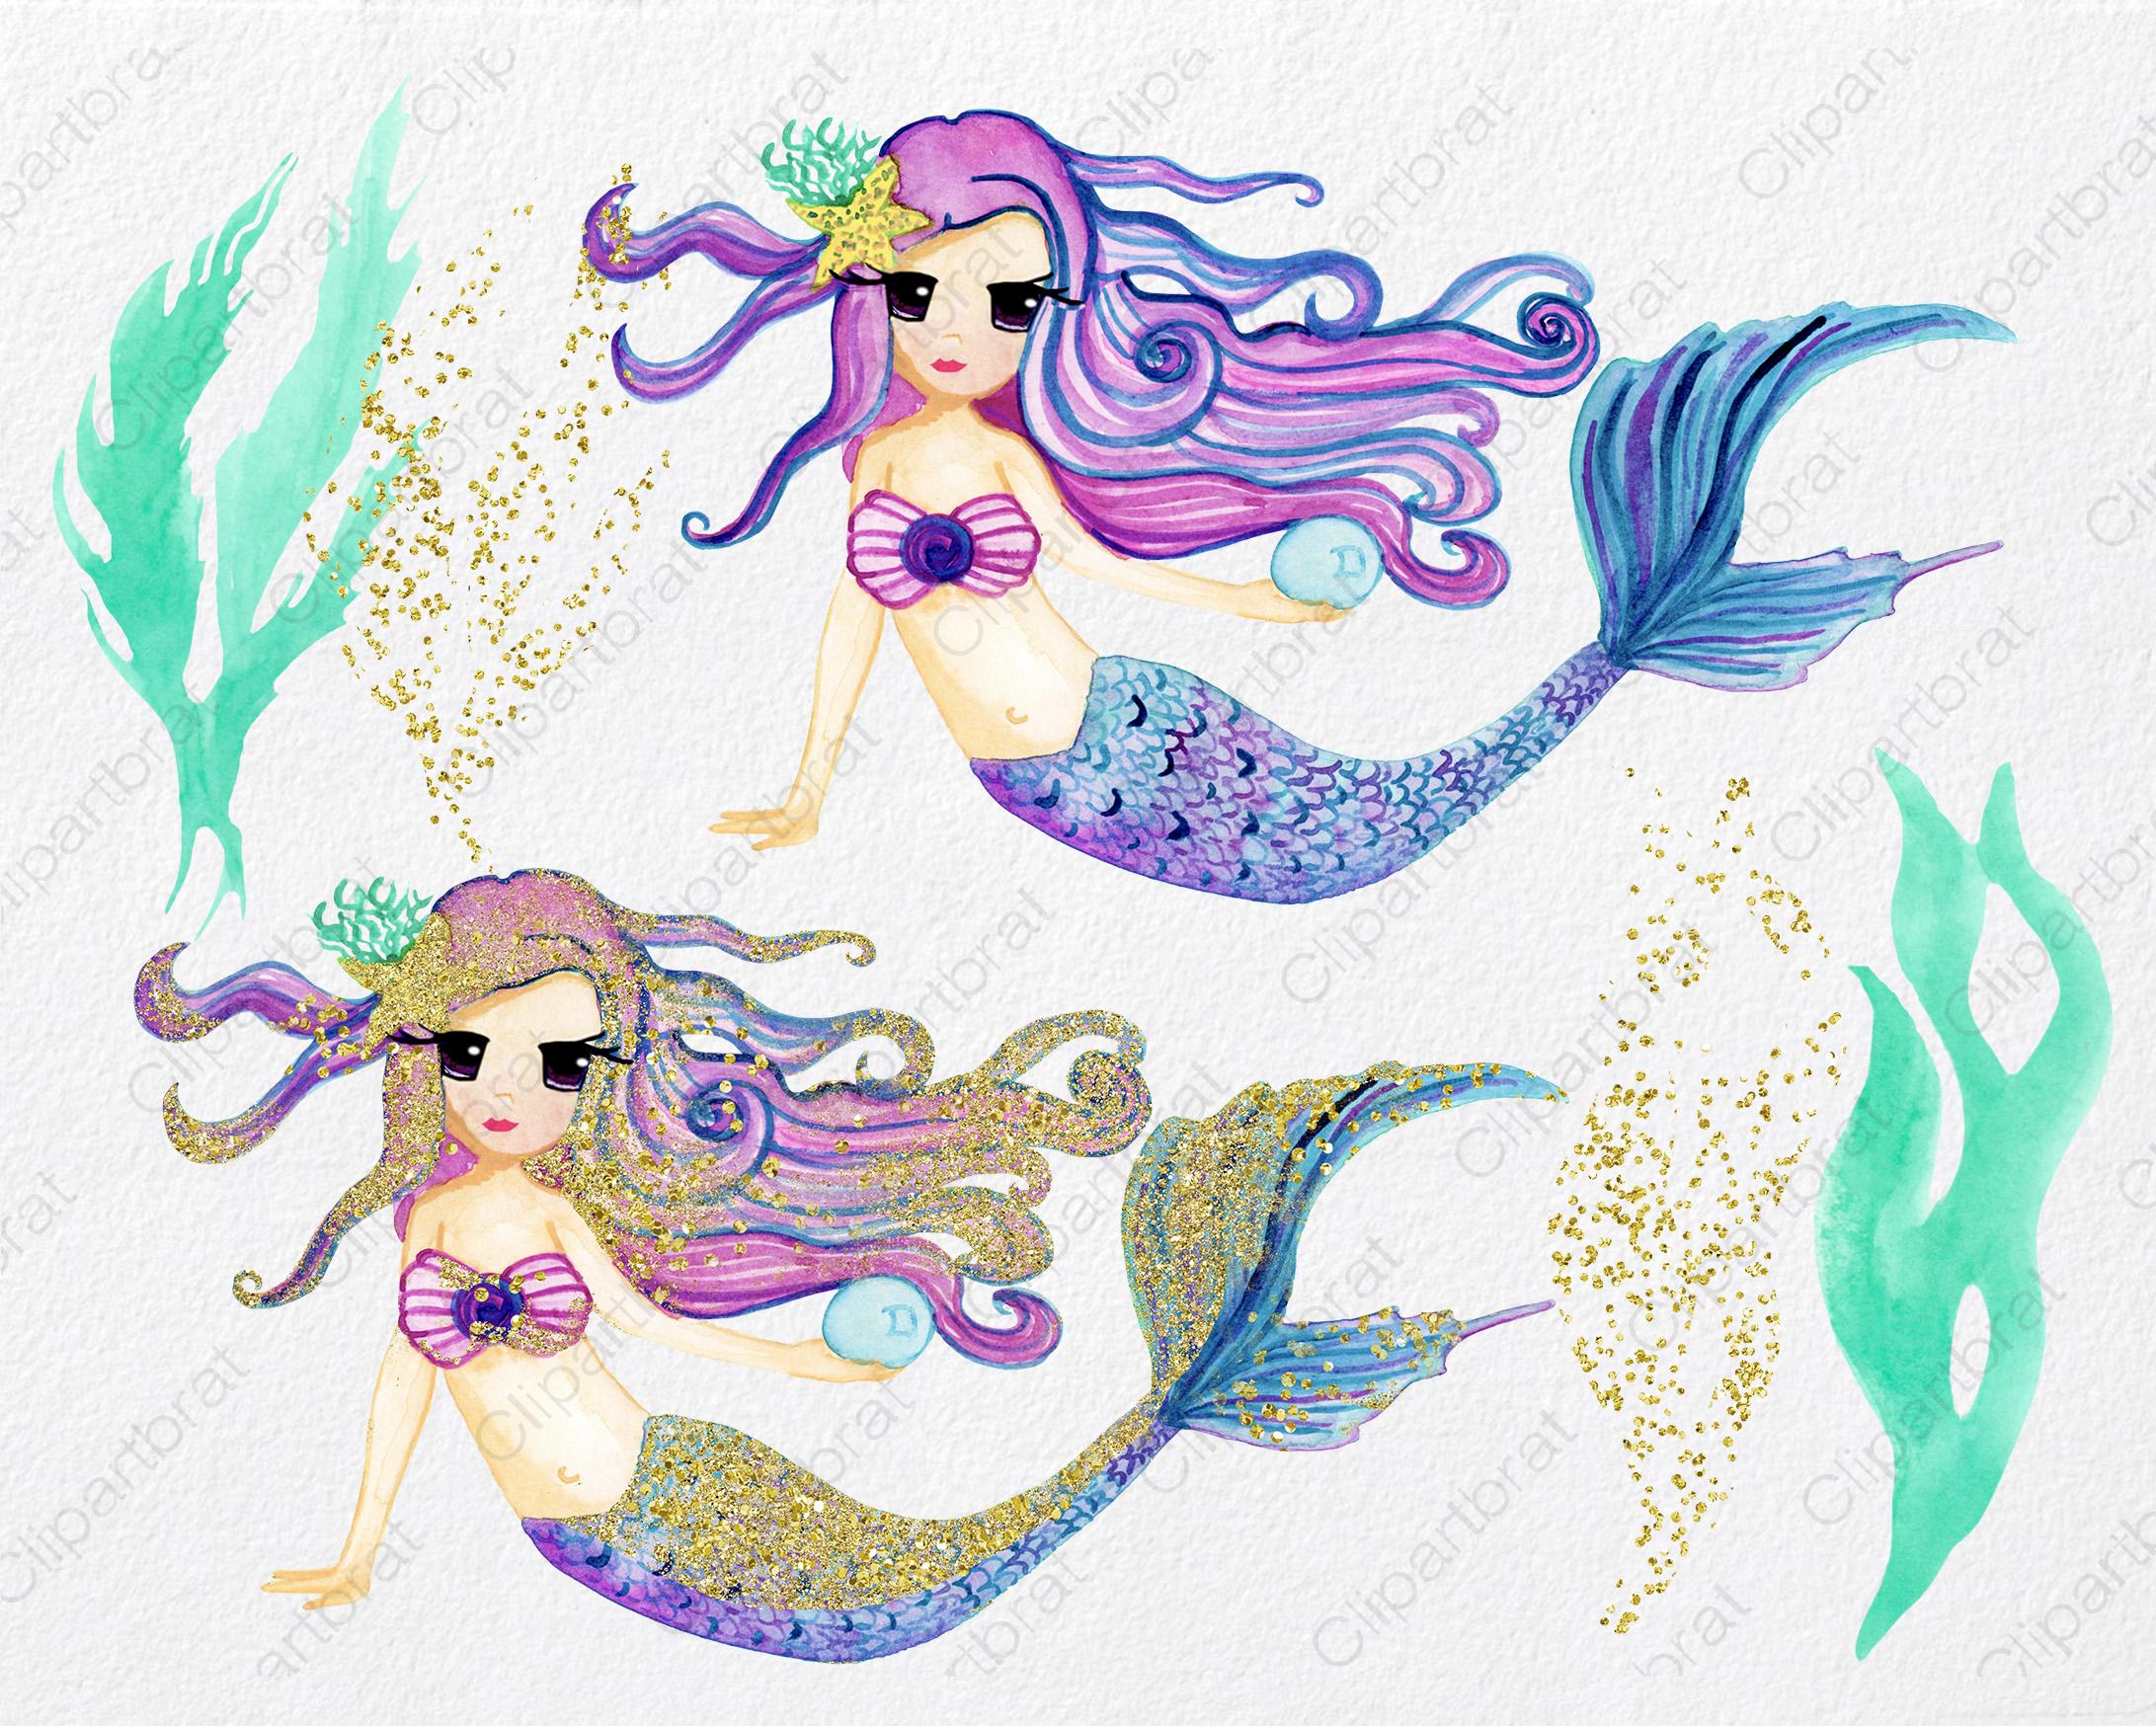 WATERCOLOR MERMAID Clipart  with Metallic Gold Confetti Mermaids Shells Starfish Ocean Watercolour Splash Graphics example image 5